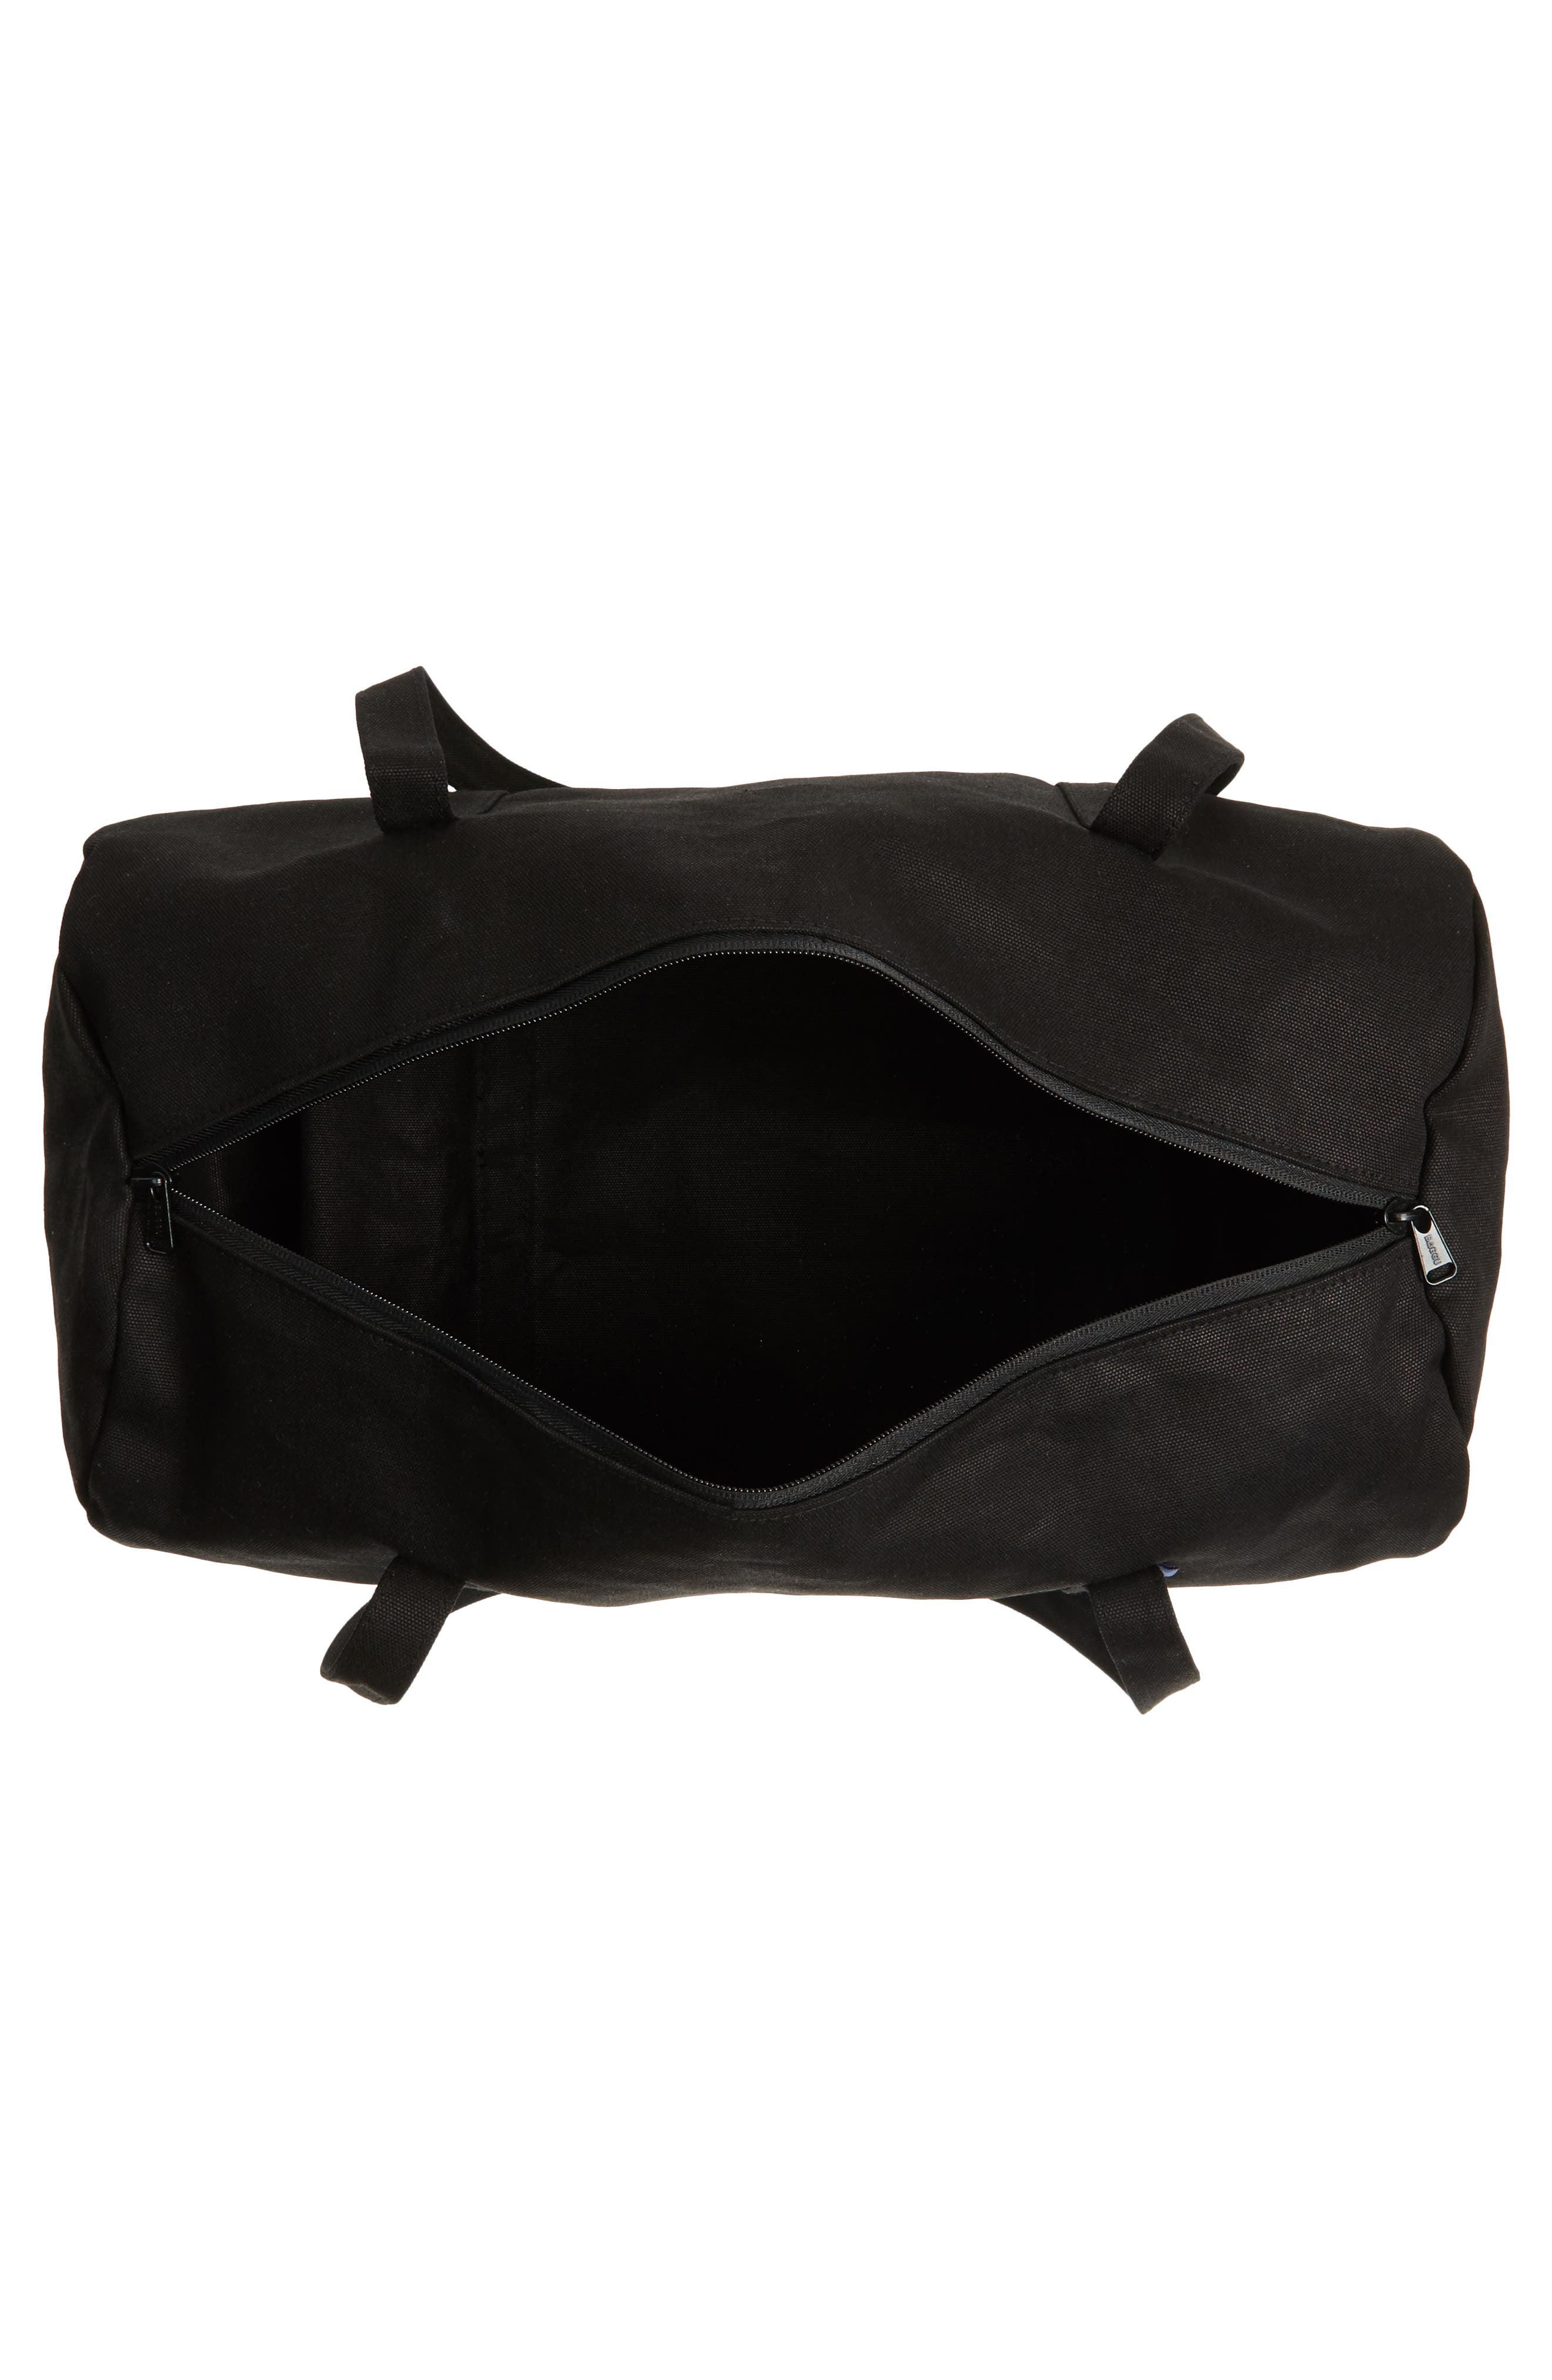 Canvas Duffel Bag,                             Alternate thumbnail 3, color,                             Black